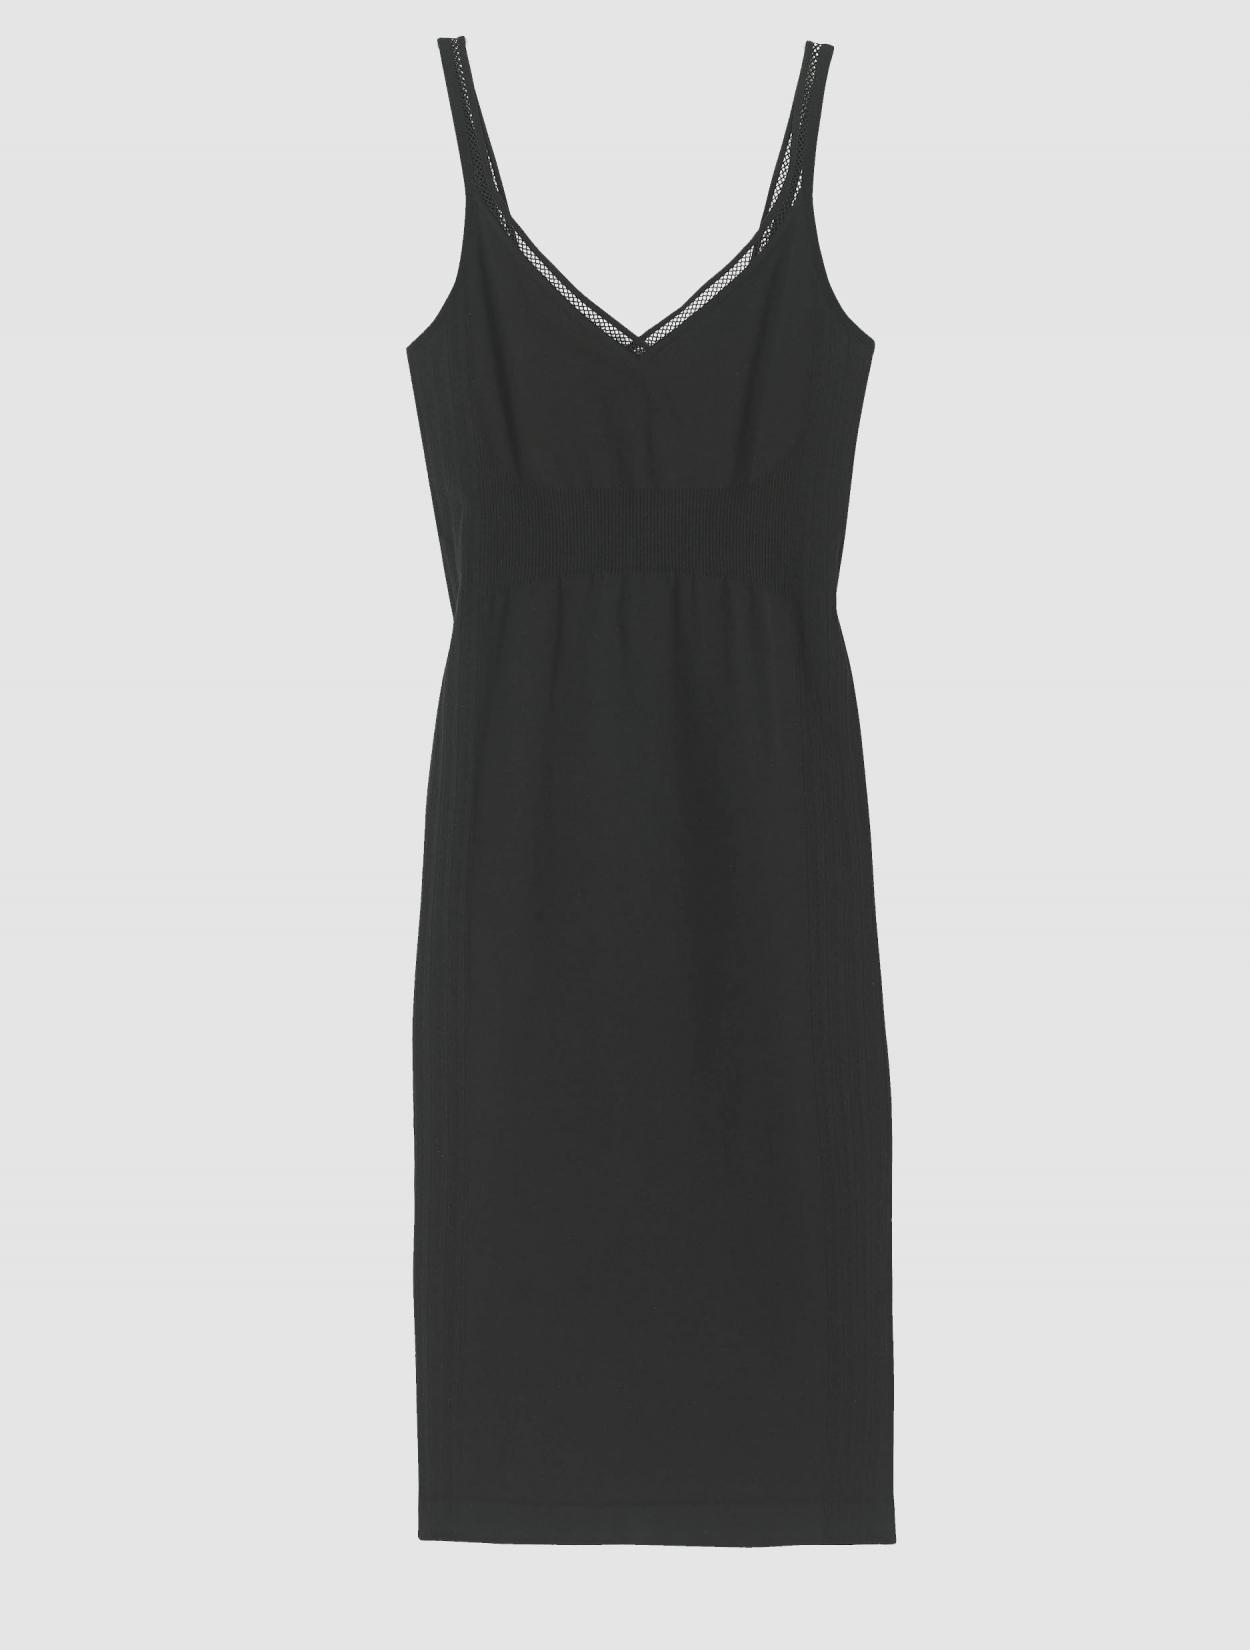 hoxton_slip_dress2_GREY_1250_1650_s_c1.jpg